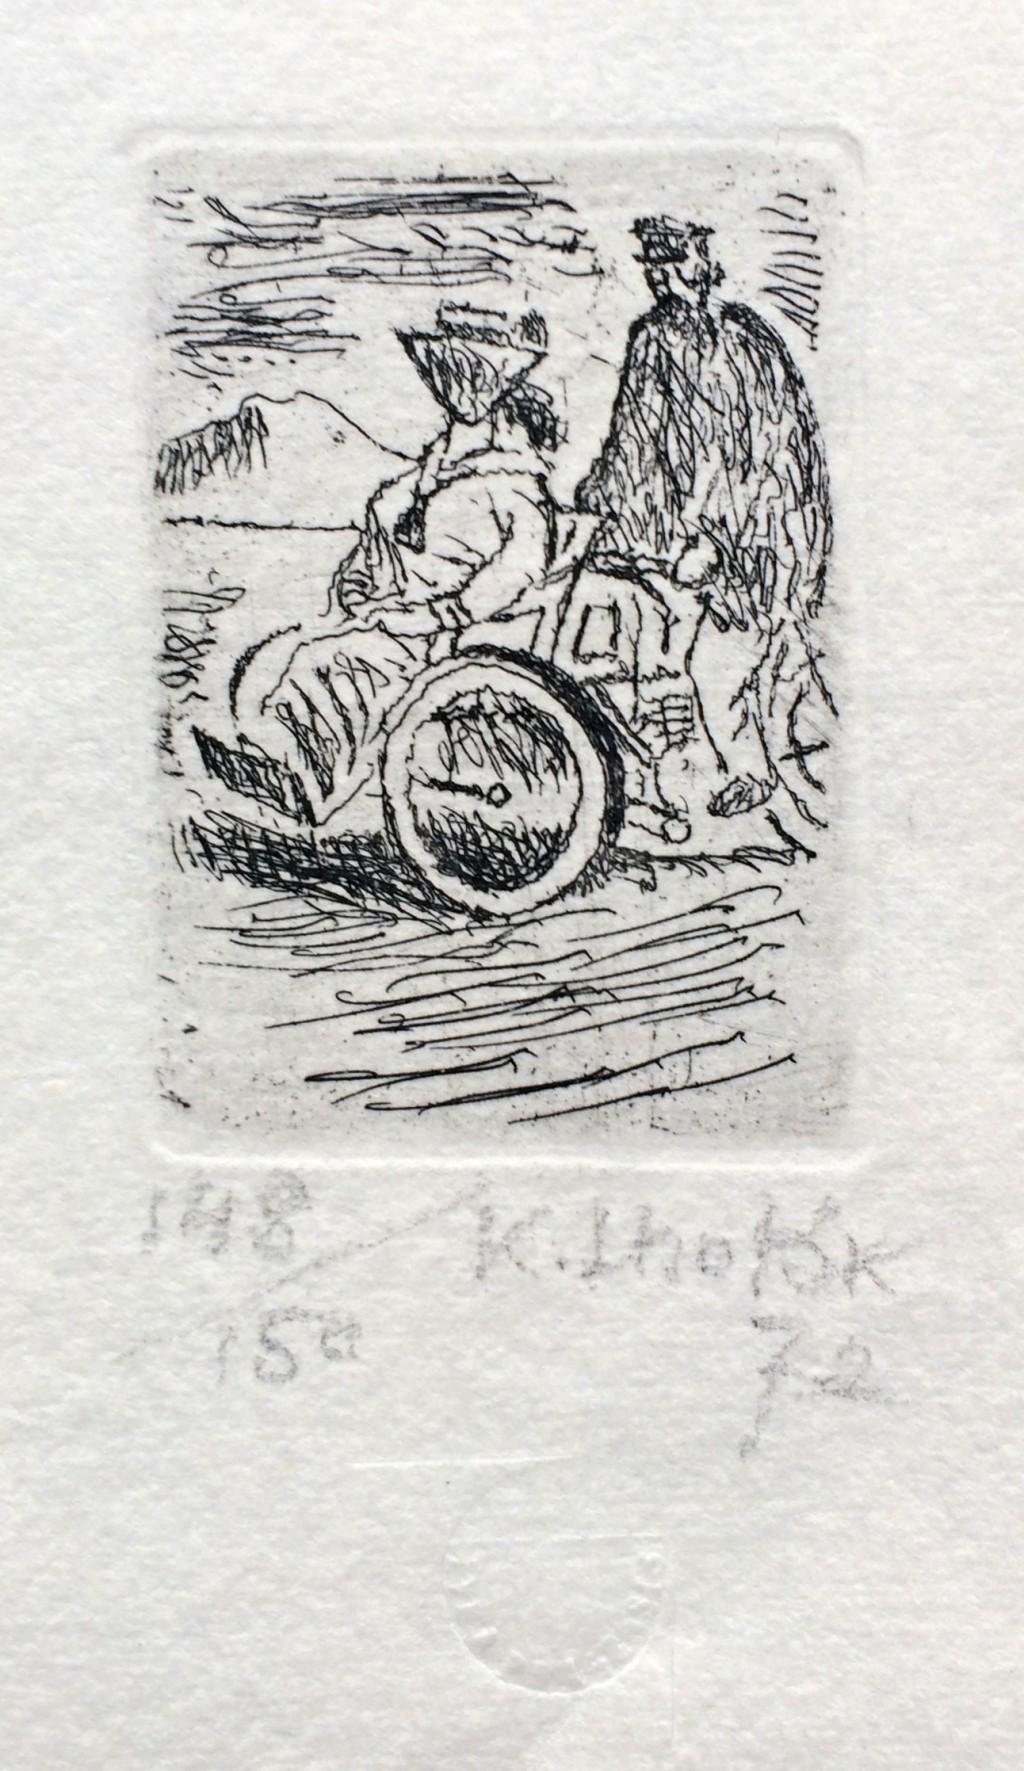 Lhoták Kamil (1912 - 1990) : Motorová tříkolka